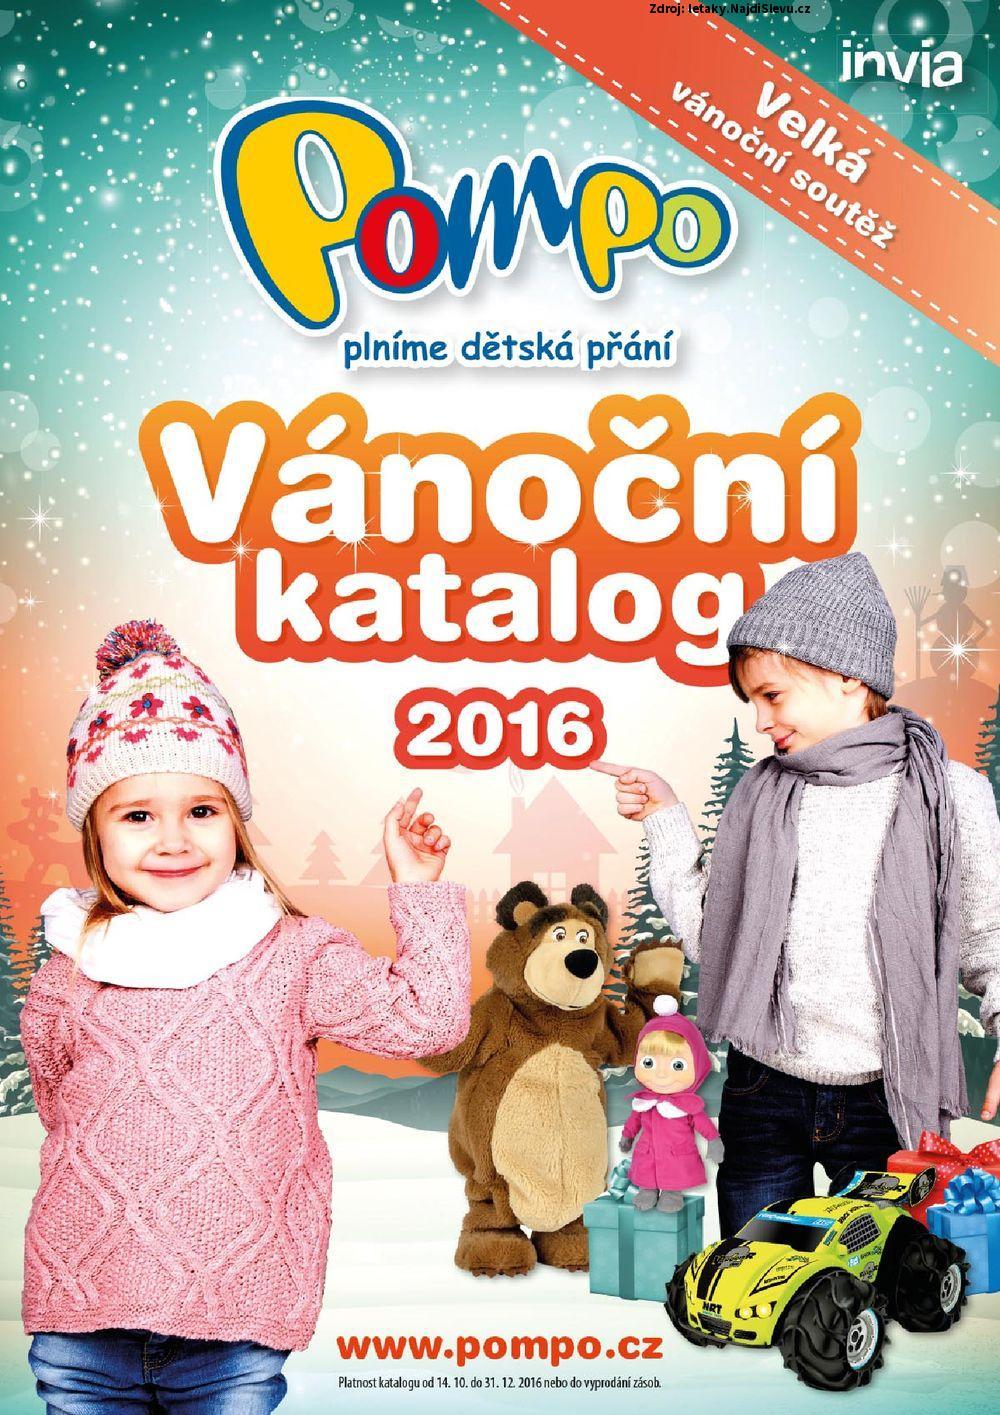 Strana 1 - leták POMPO (14. 10. - 31. 12. 2016)